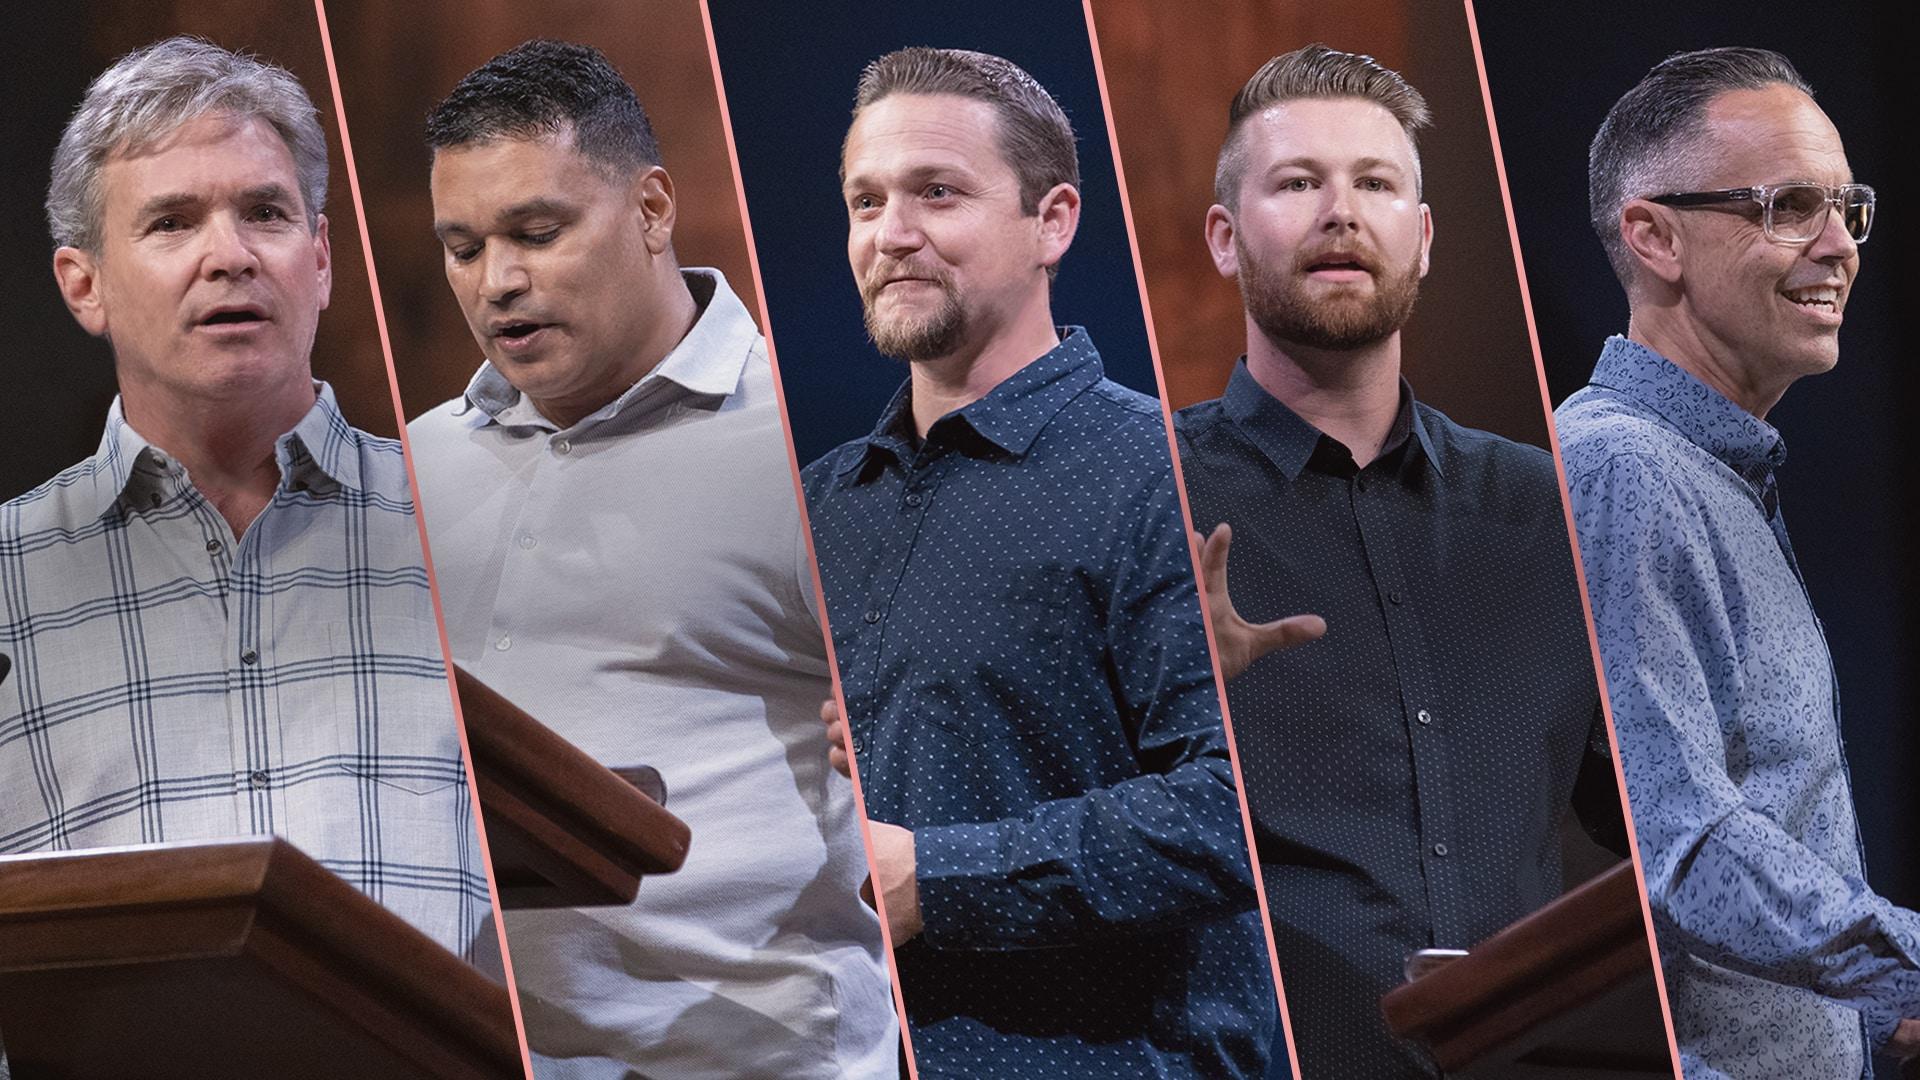 Returning – Passion Wednesday Message